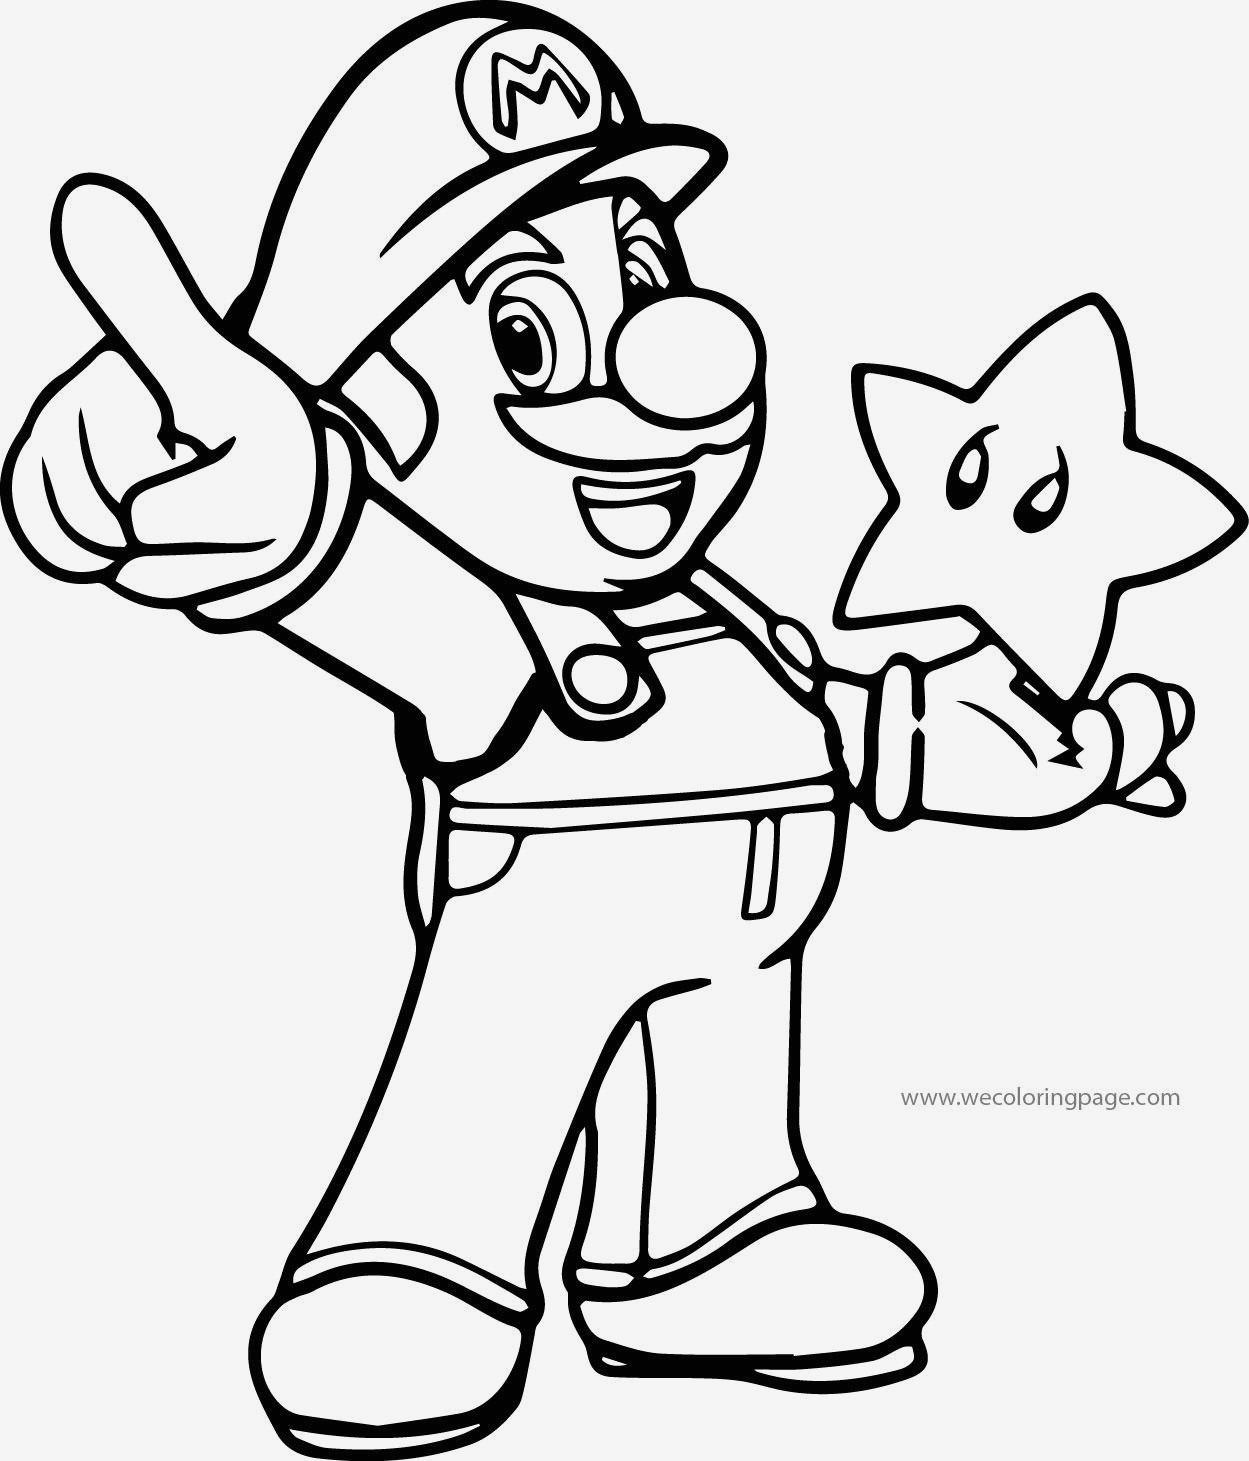 Ausmalbild Super Mario Genial Spannende Coloring Bilder Super Mario Malvorlagen Fotos